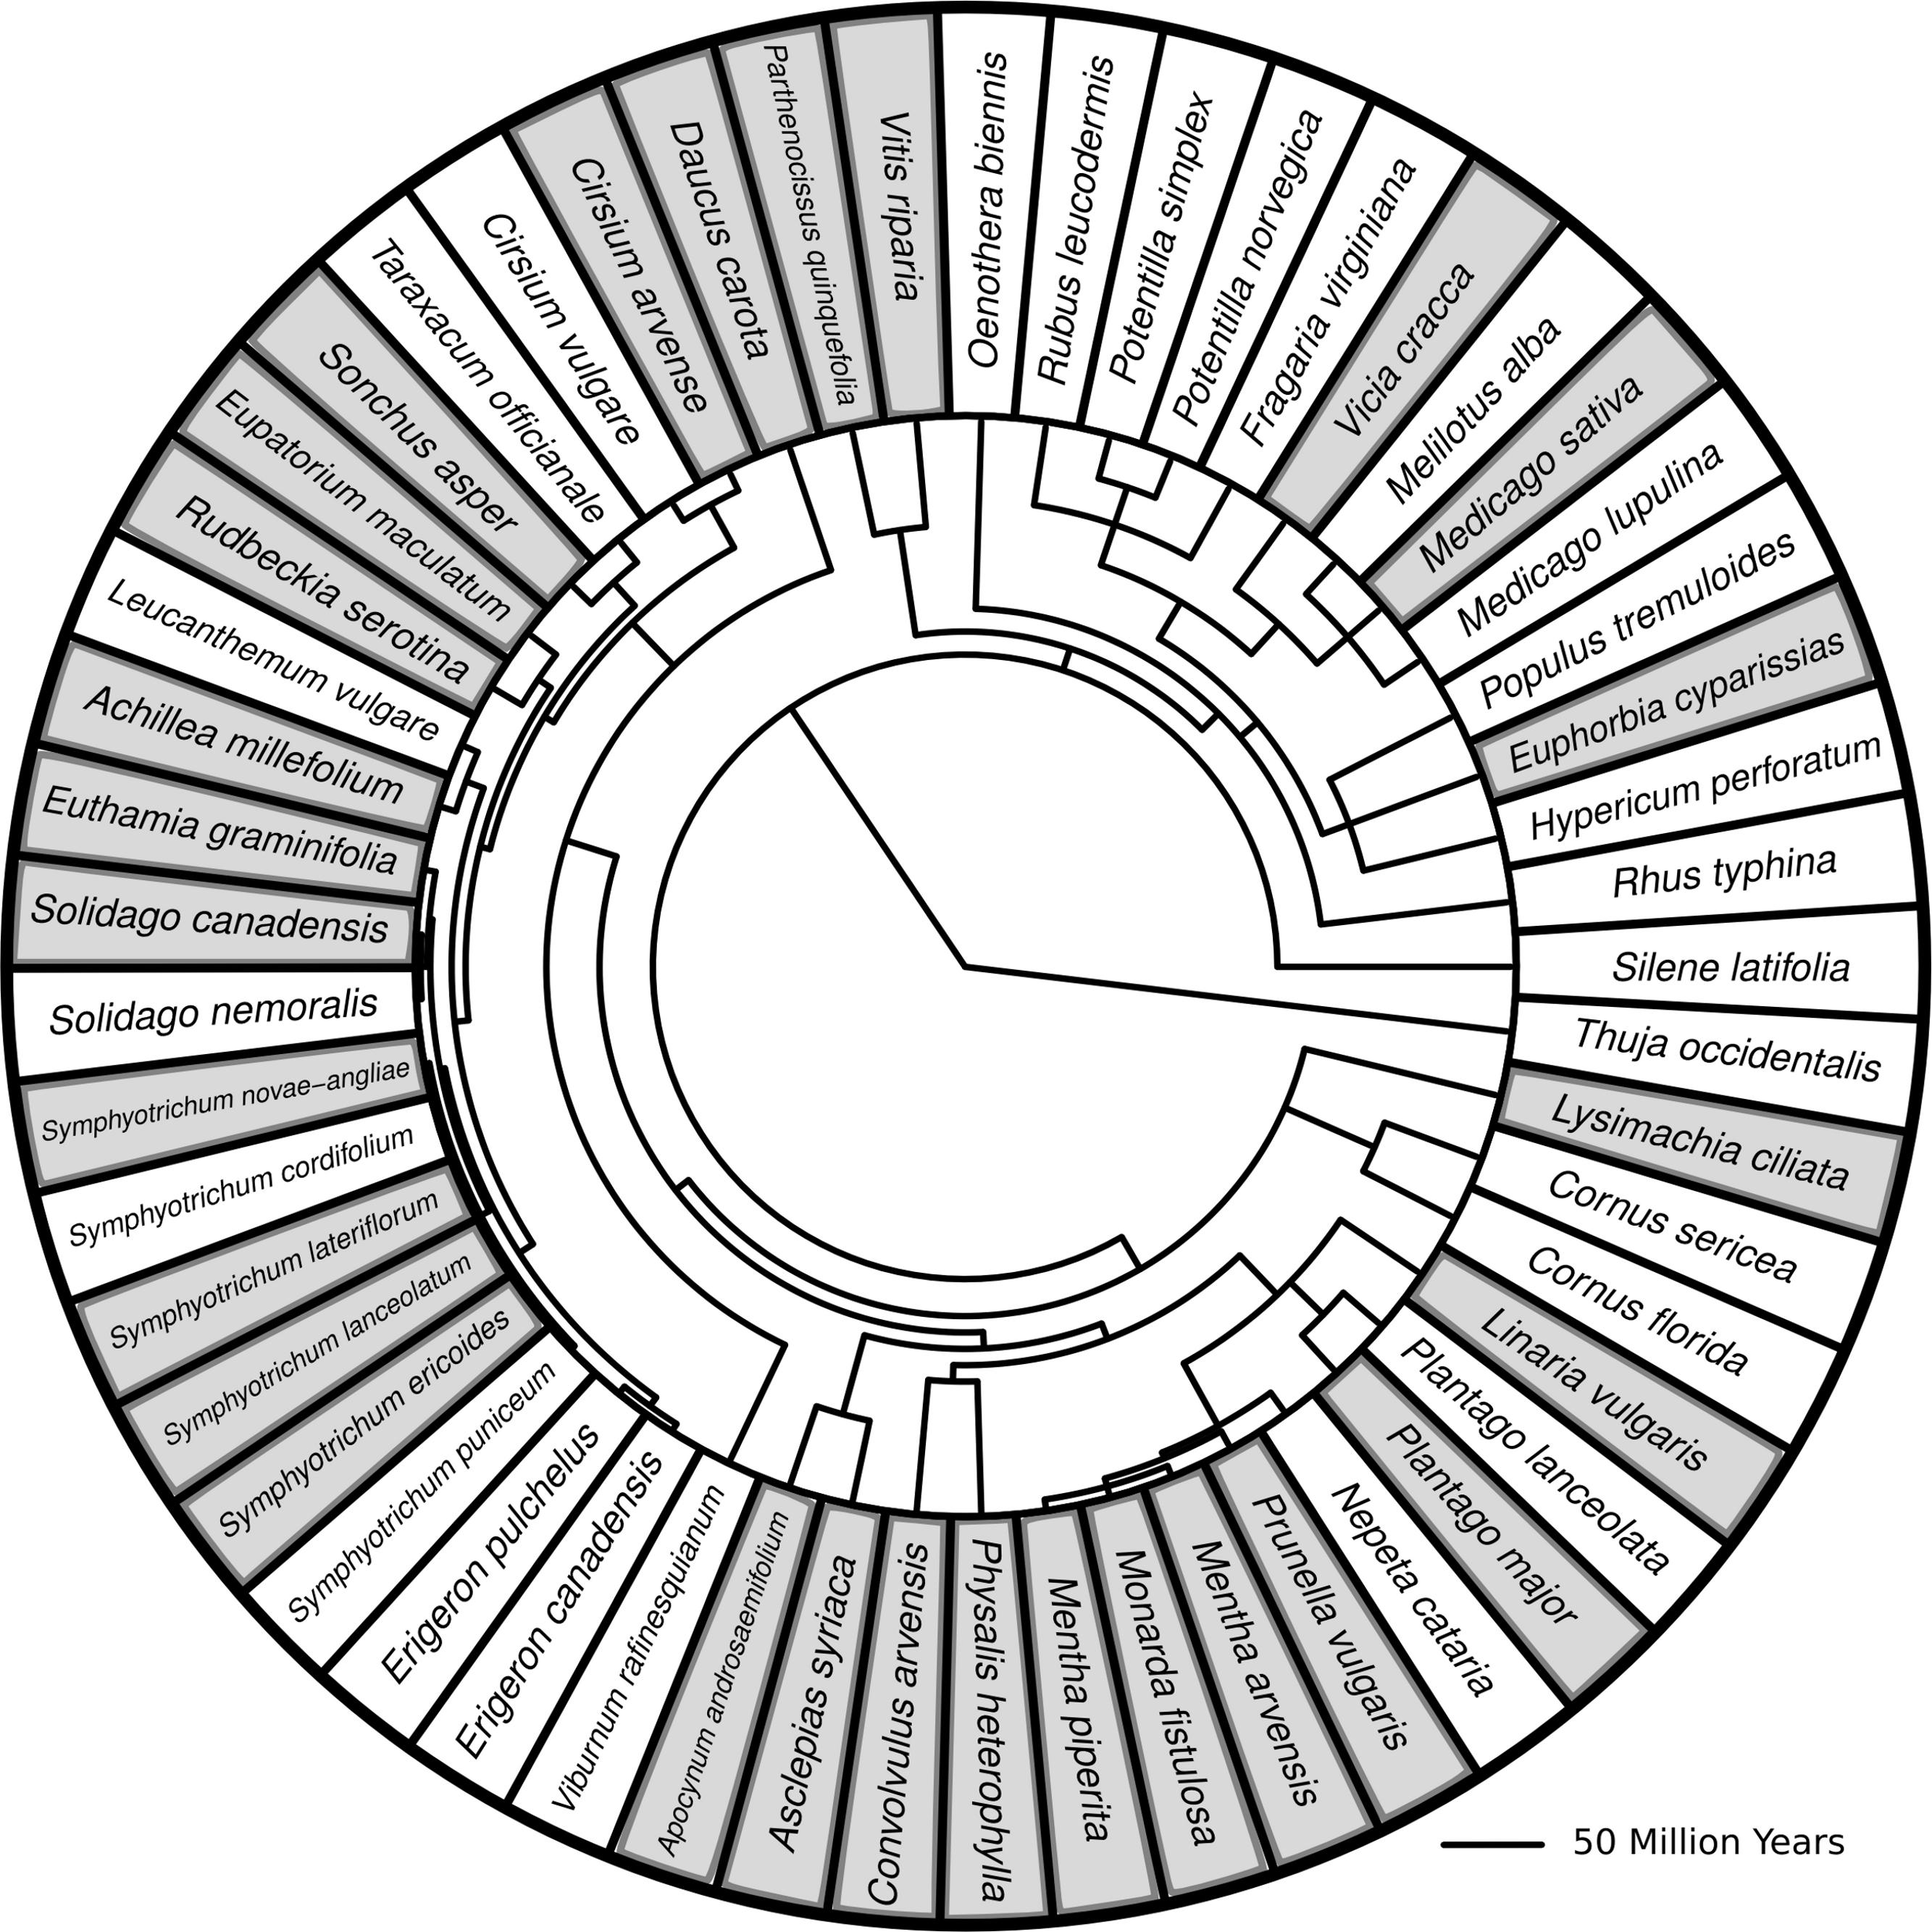 Proofreadingwebsite Web Fc2 Com: Species Diversity Literature Review